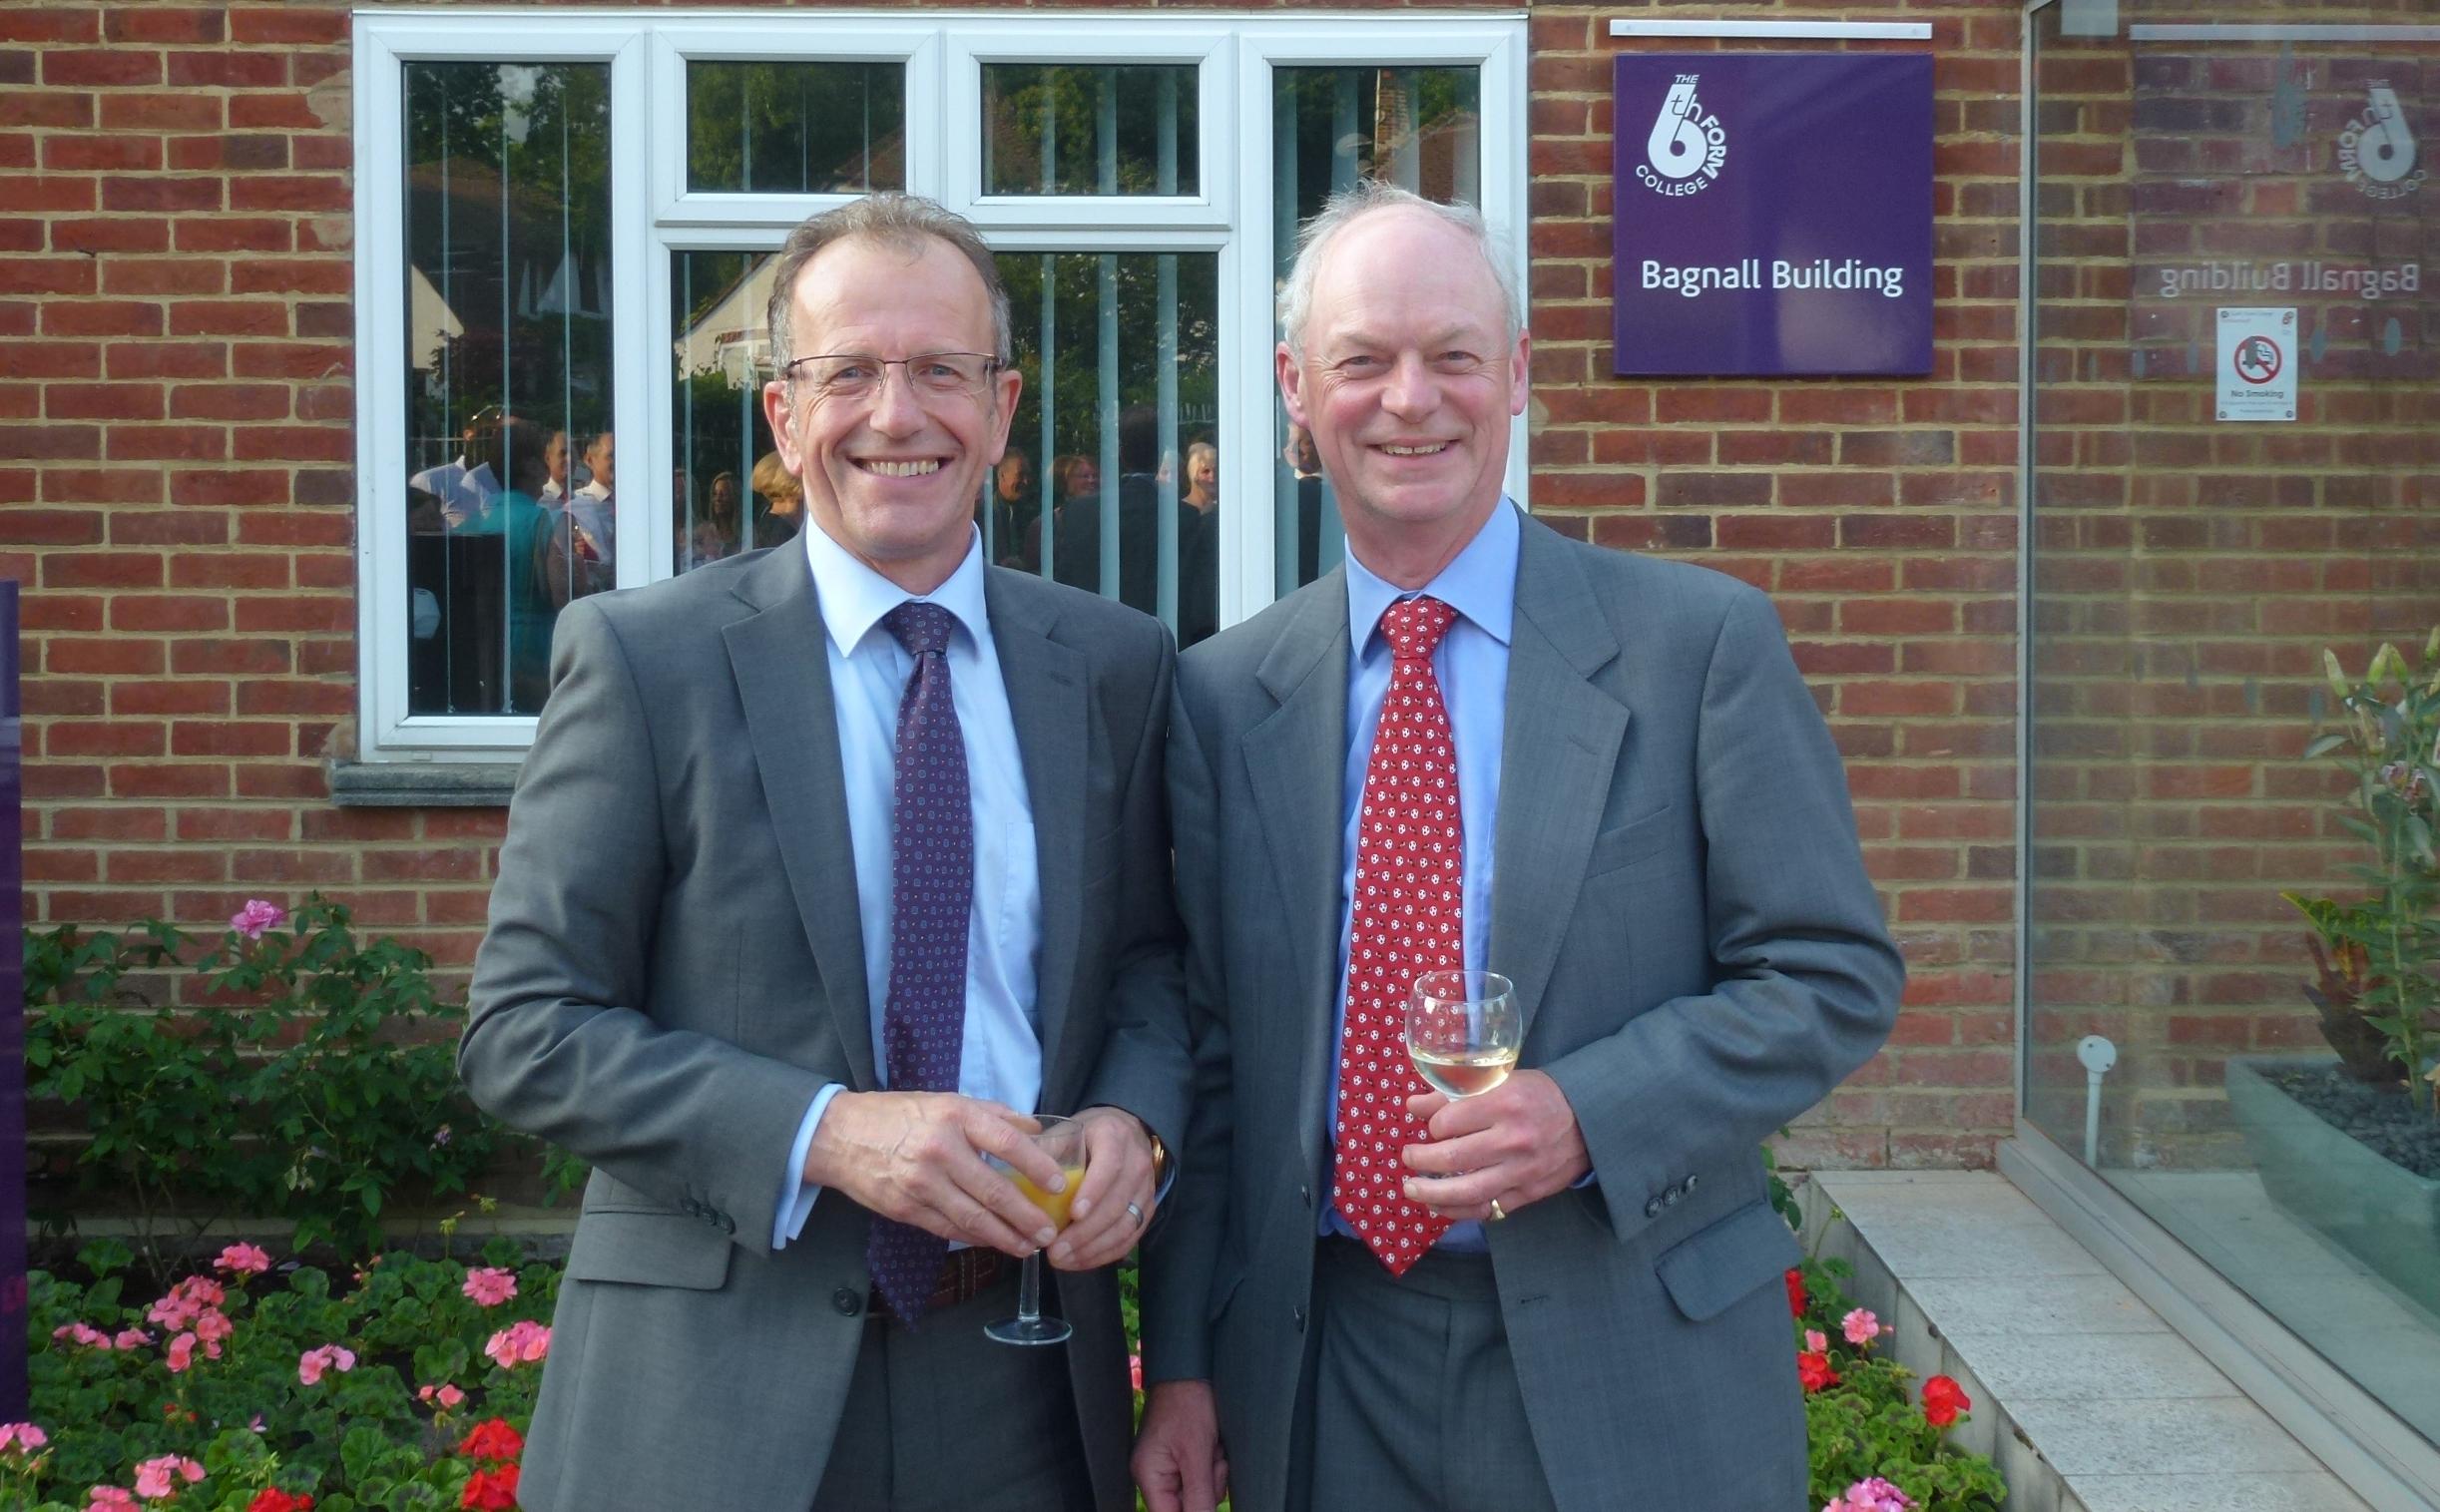 Principal Simon Jarvis with William Bagnall